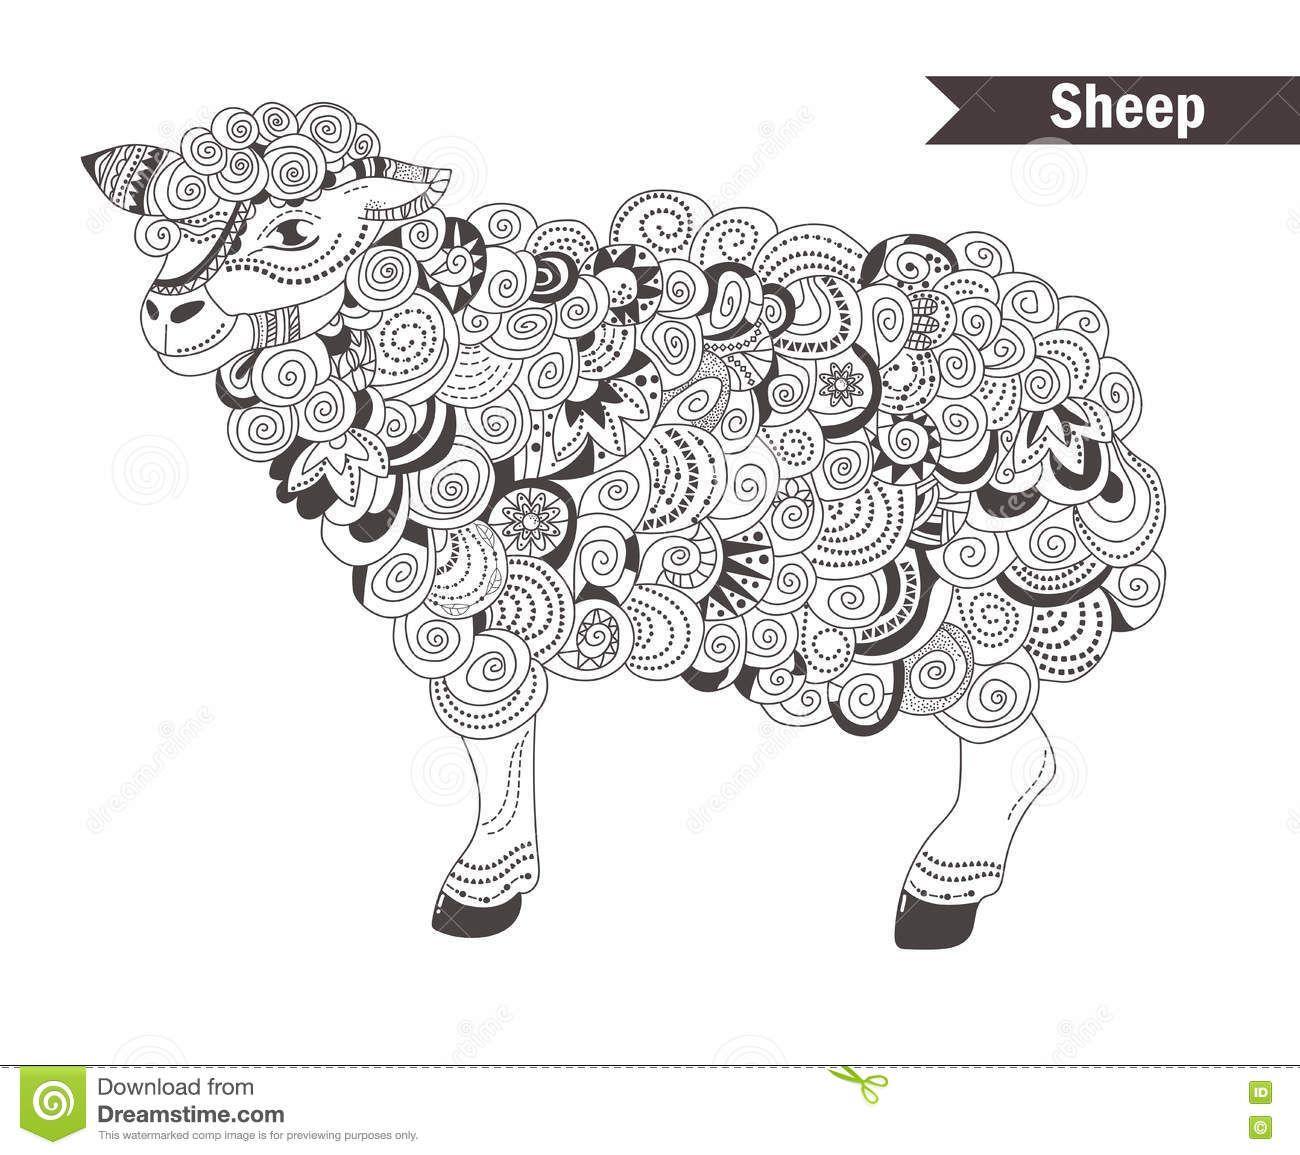 Pin by Jennifer Hudson on VBS 2017, God\'s Sheep   Pinterest ...